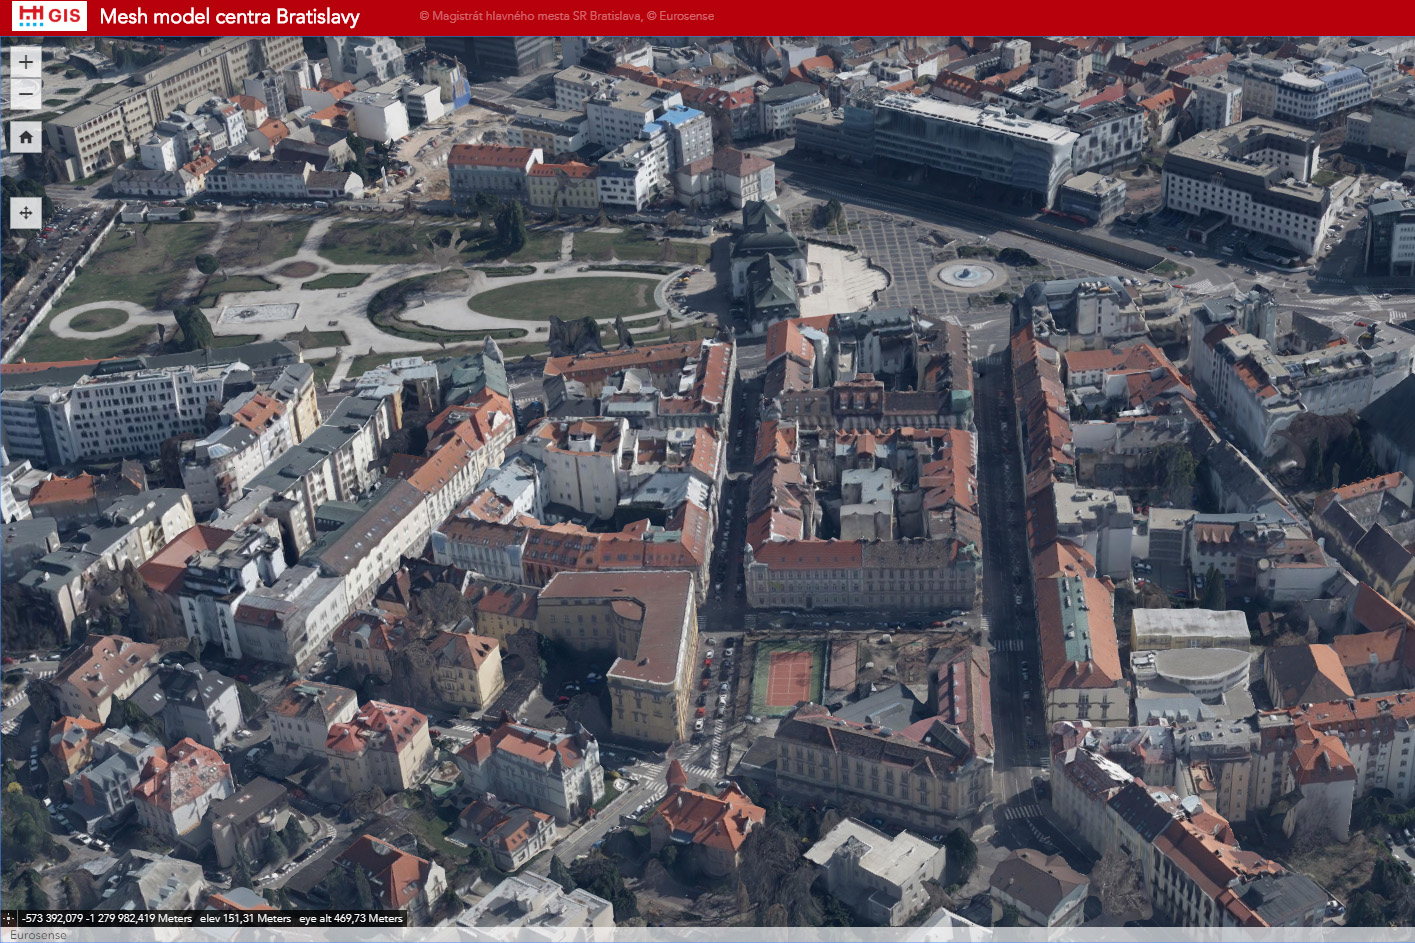 Bratislava 3D model